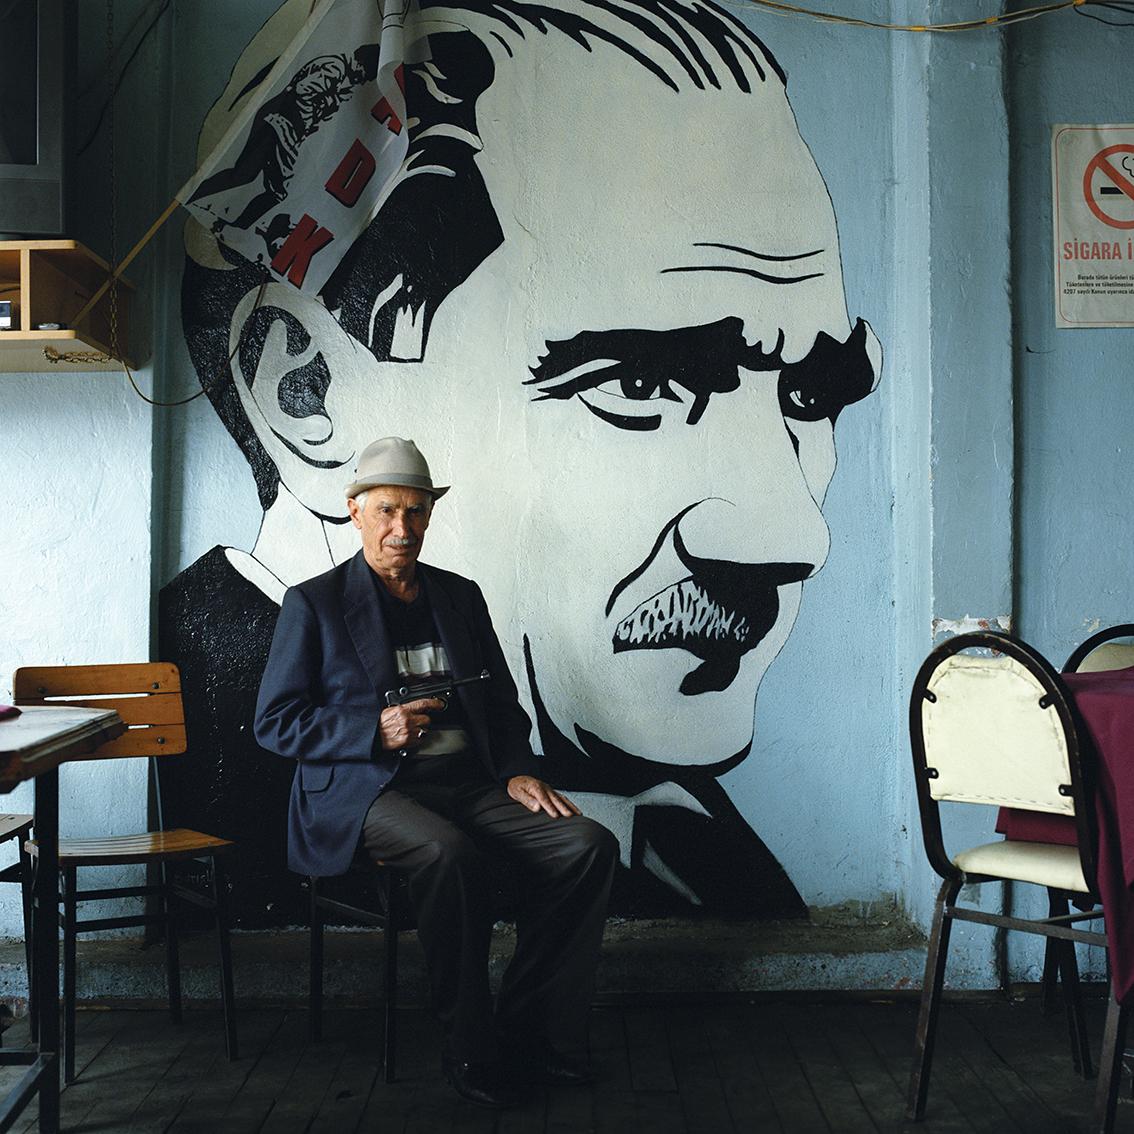 Coffee house on Tonya, Turkey